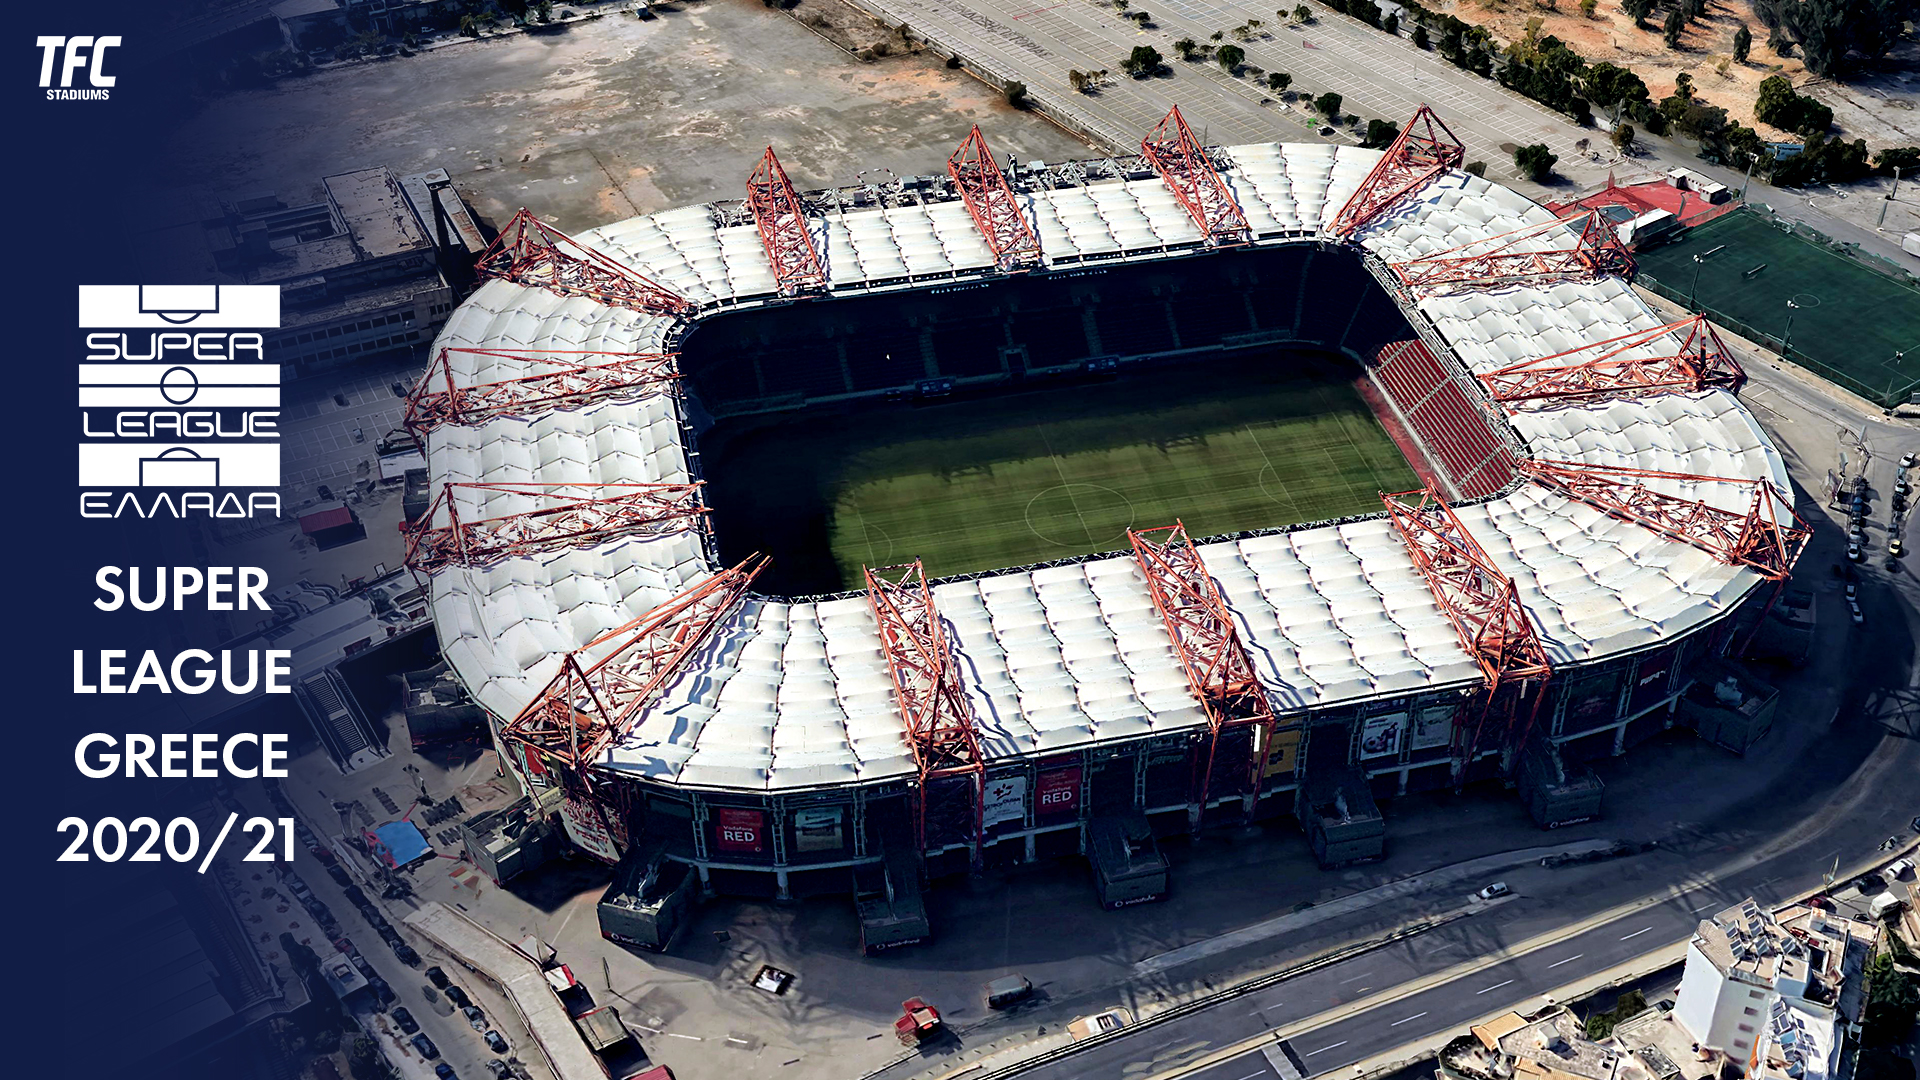 Super League Greece 2020/21 Stadiums - TFC Stadiums